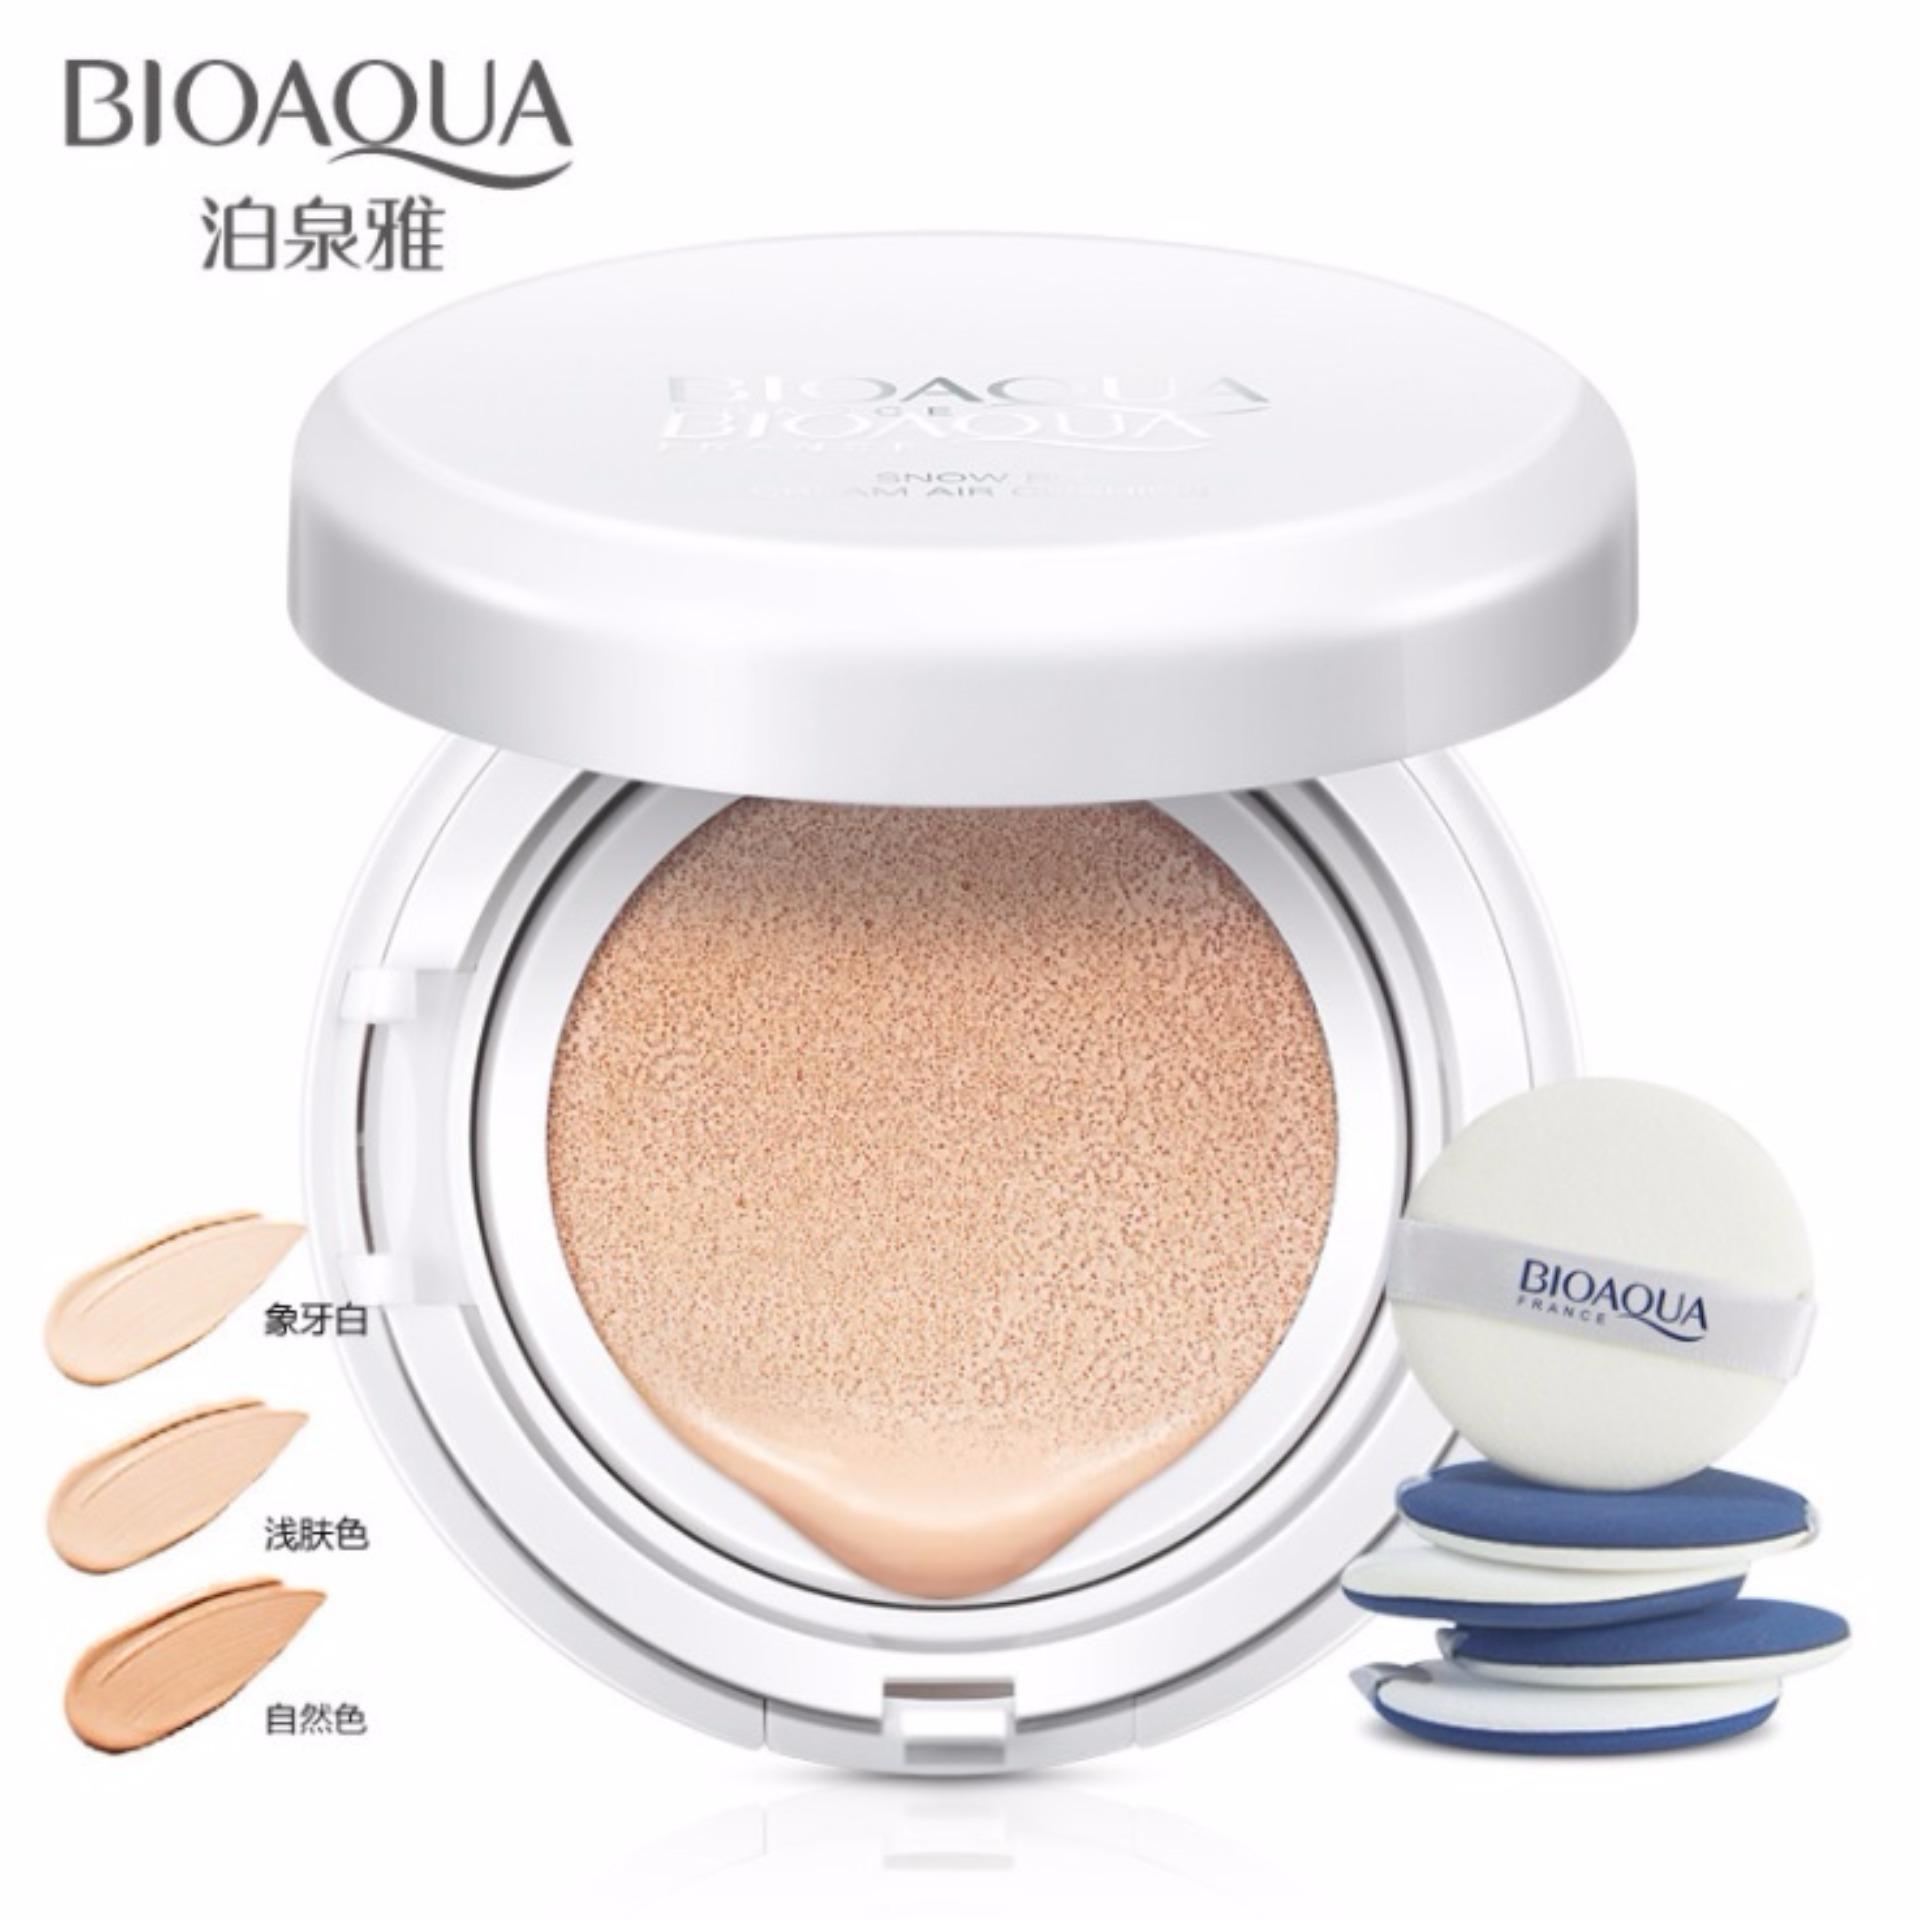 Bioaqua Blush On Cushion Smooth Muscle Flawless 2 Peach Pink Smoot Bb Blusher Source Bqy9822